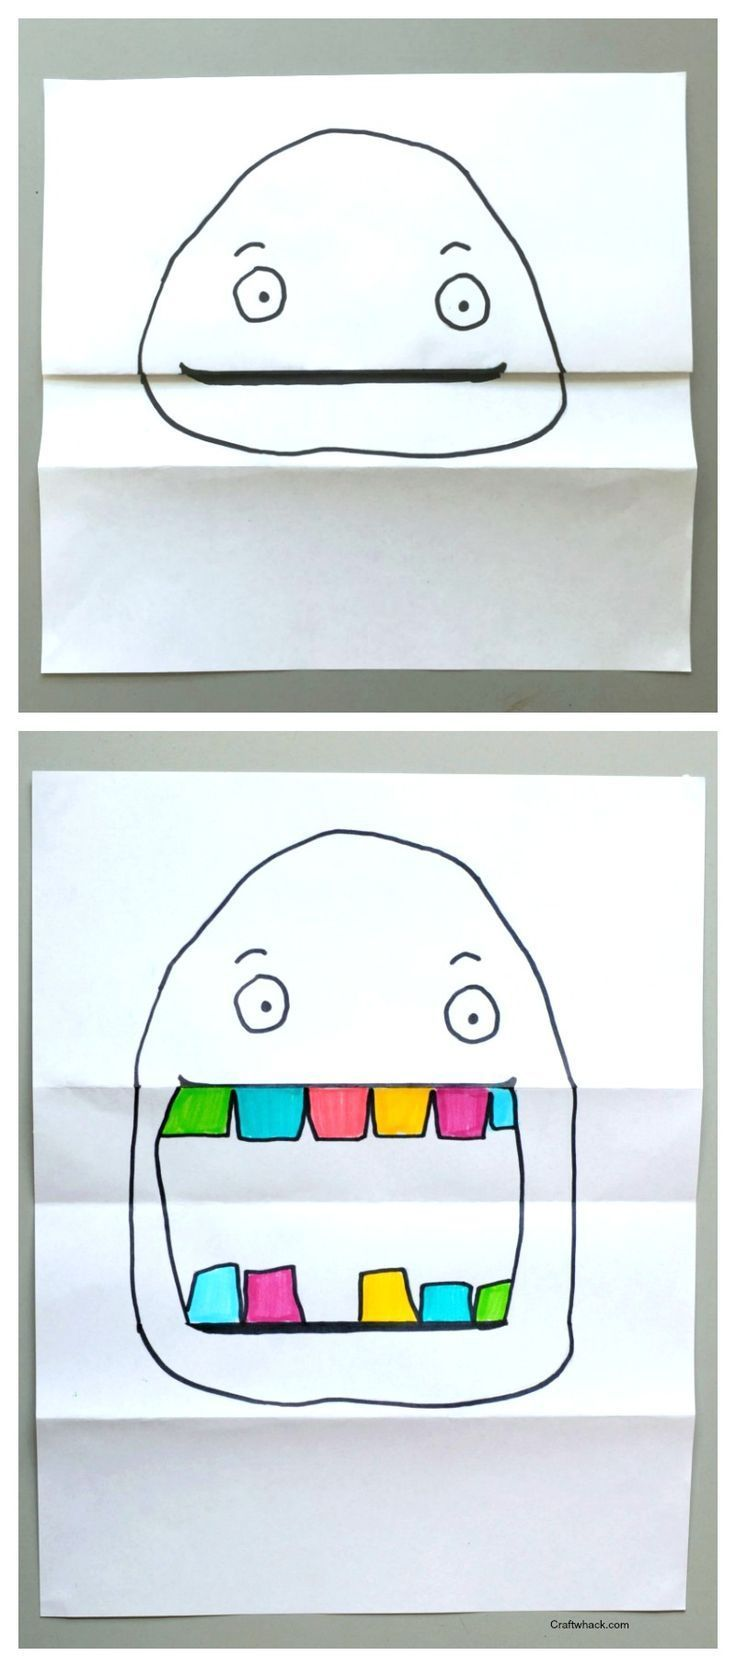 Gefaltetes Papierprojekt • Craftwhack.com #paperprojects